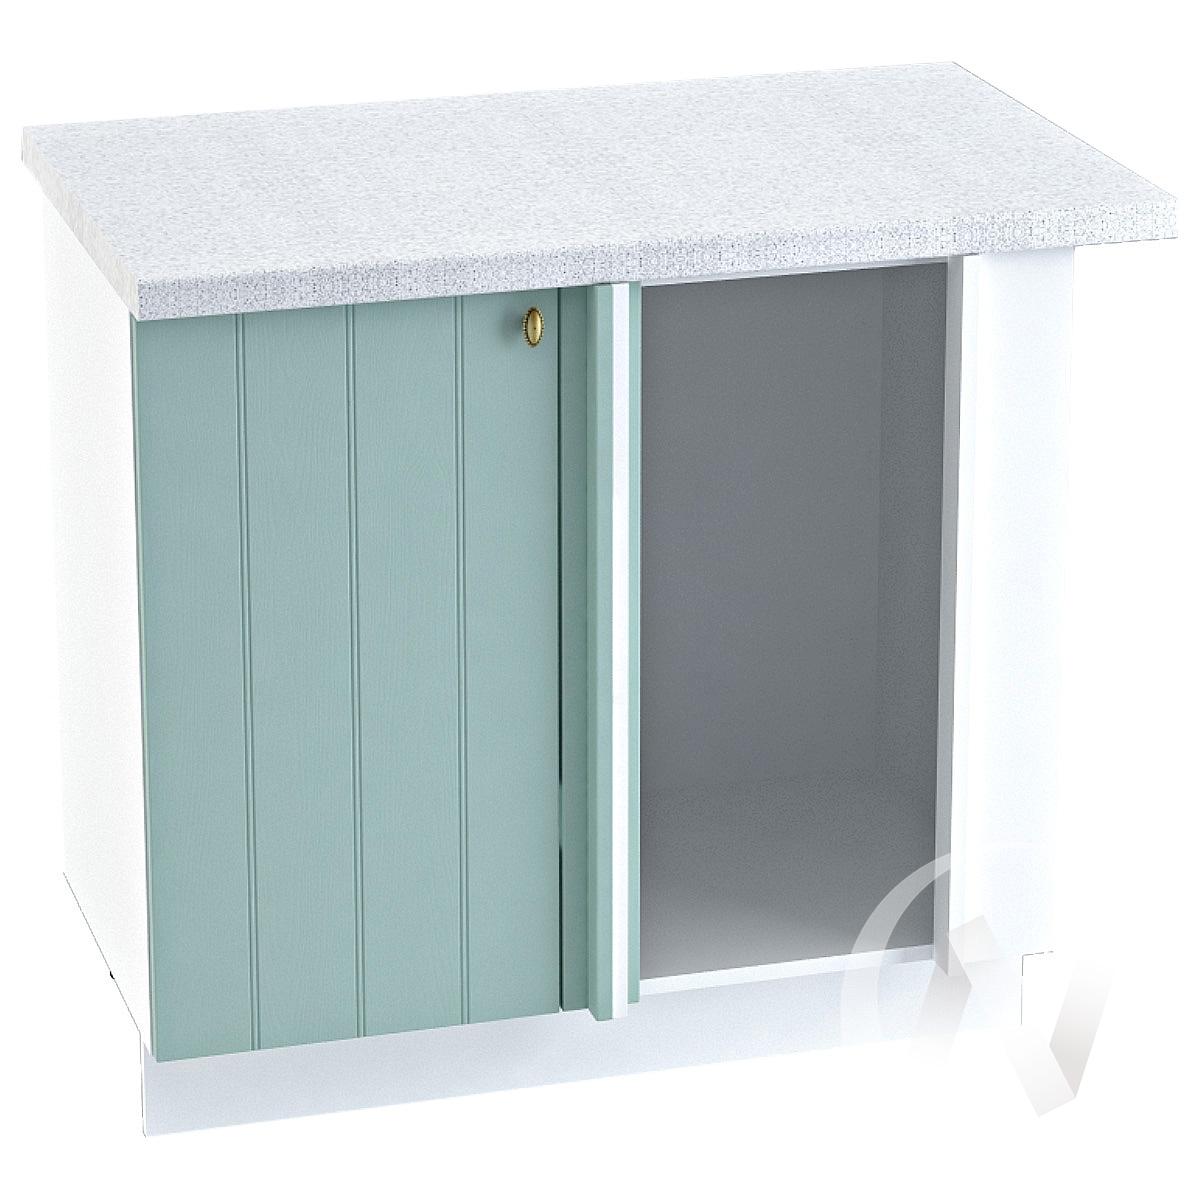 "Кухня ""Прованс"": Шкаф нижний угловой 990М, ШНУ 990М (голубой/корпус белый)"